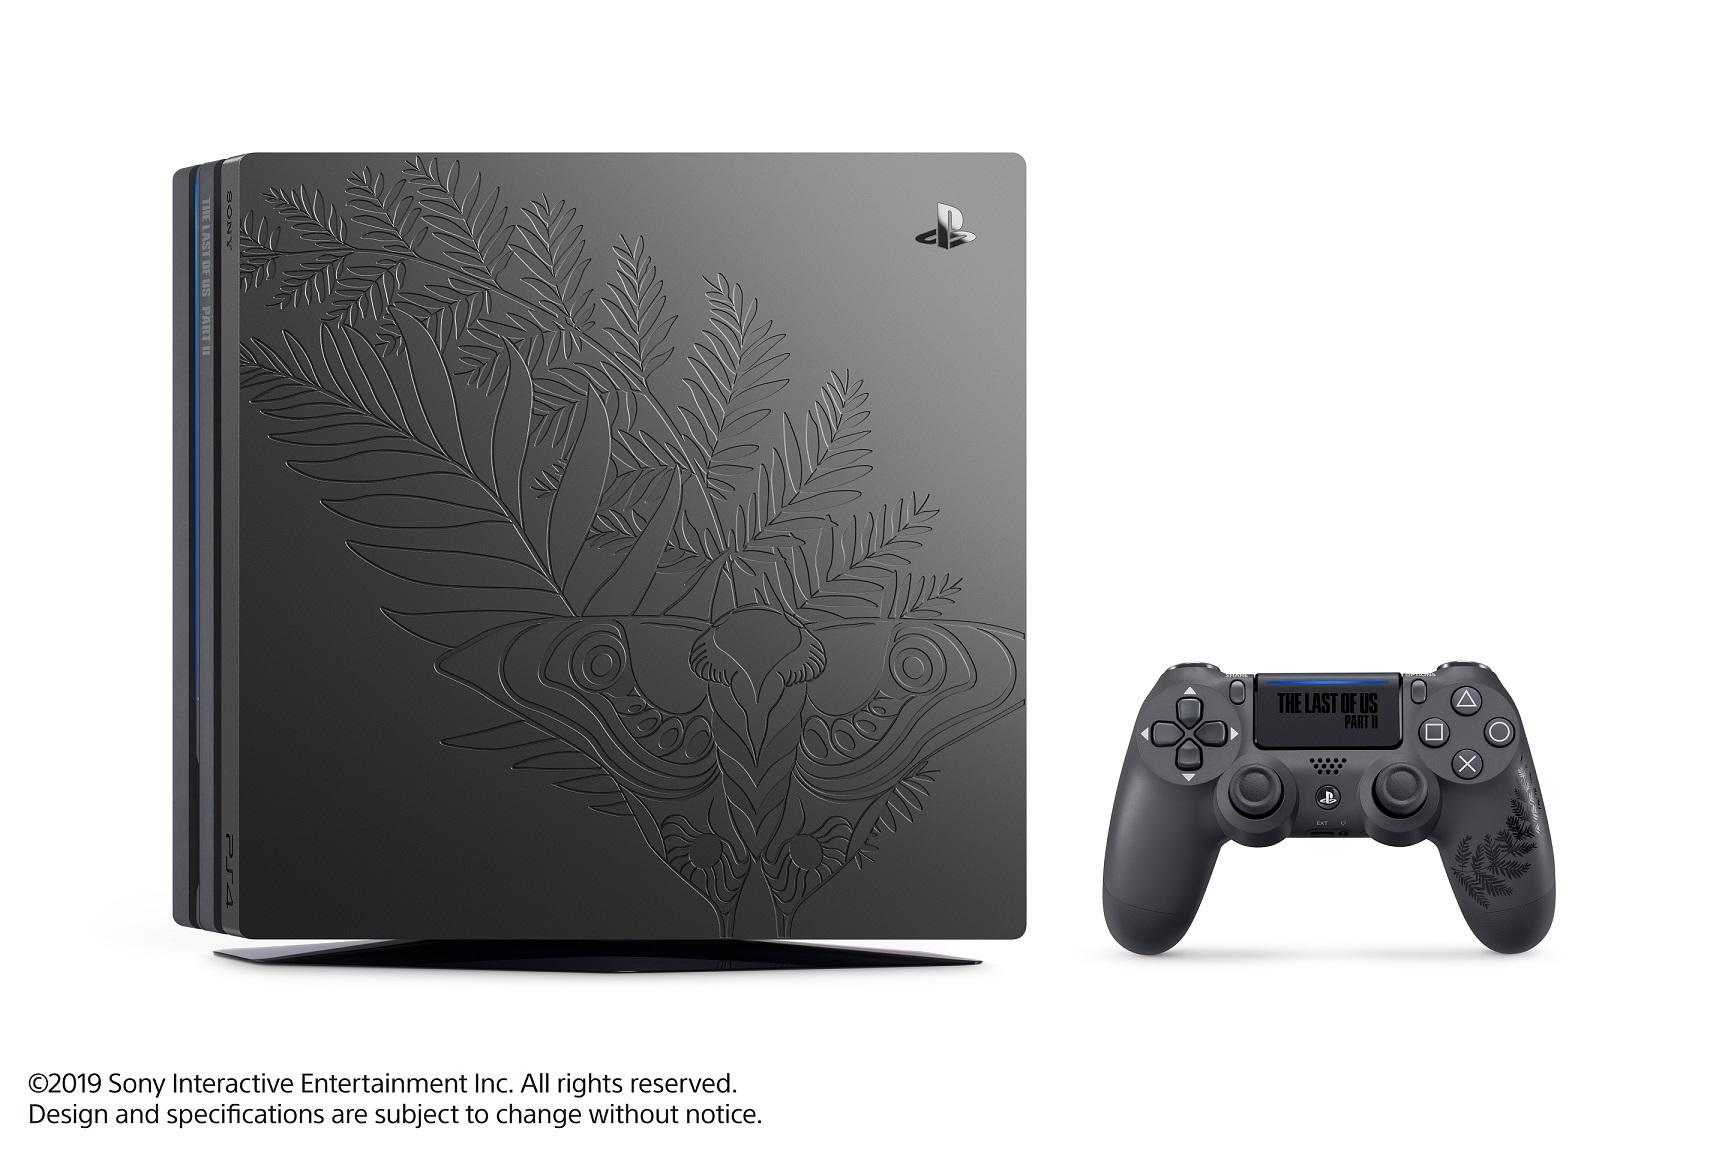 The Last of Us 2 PlayStation 4 bundle